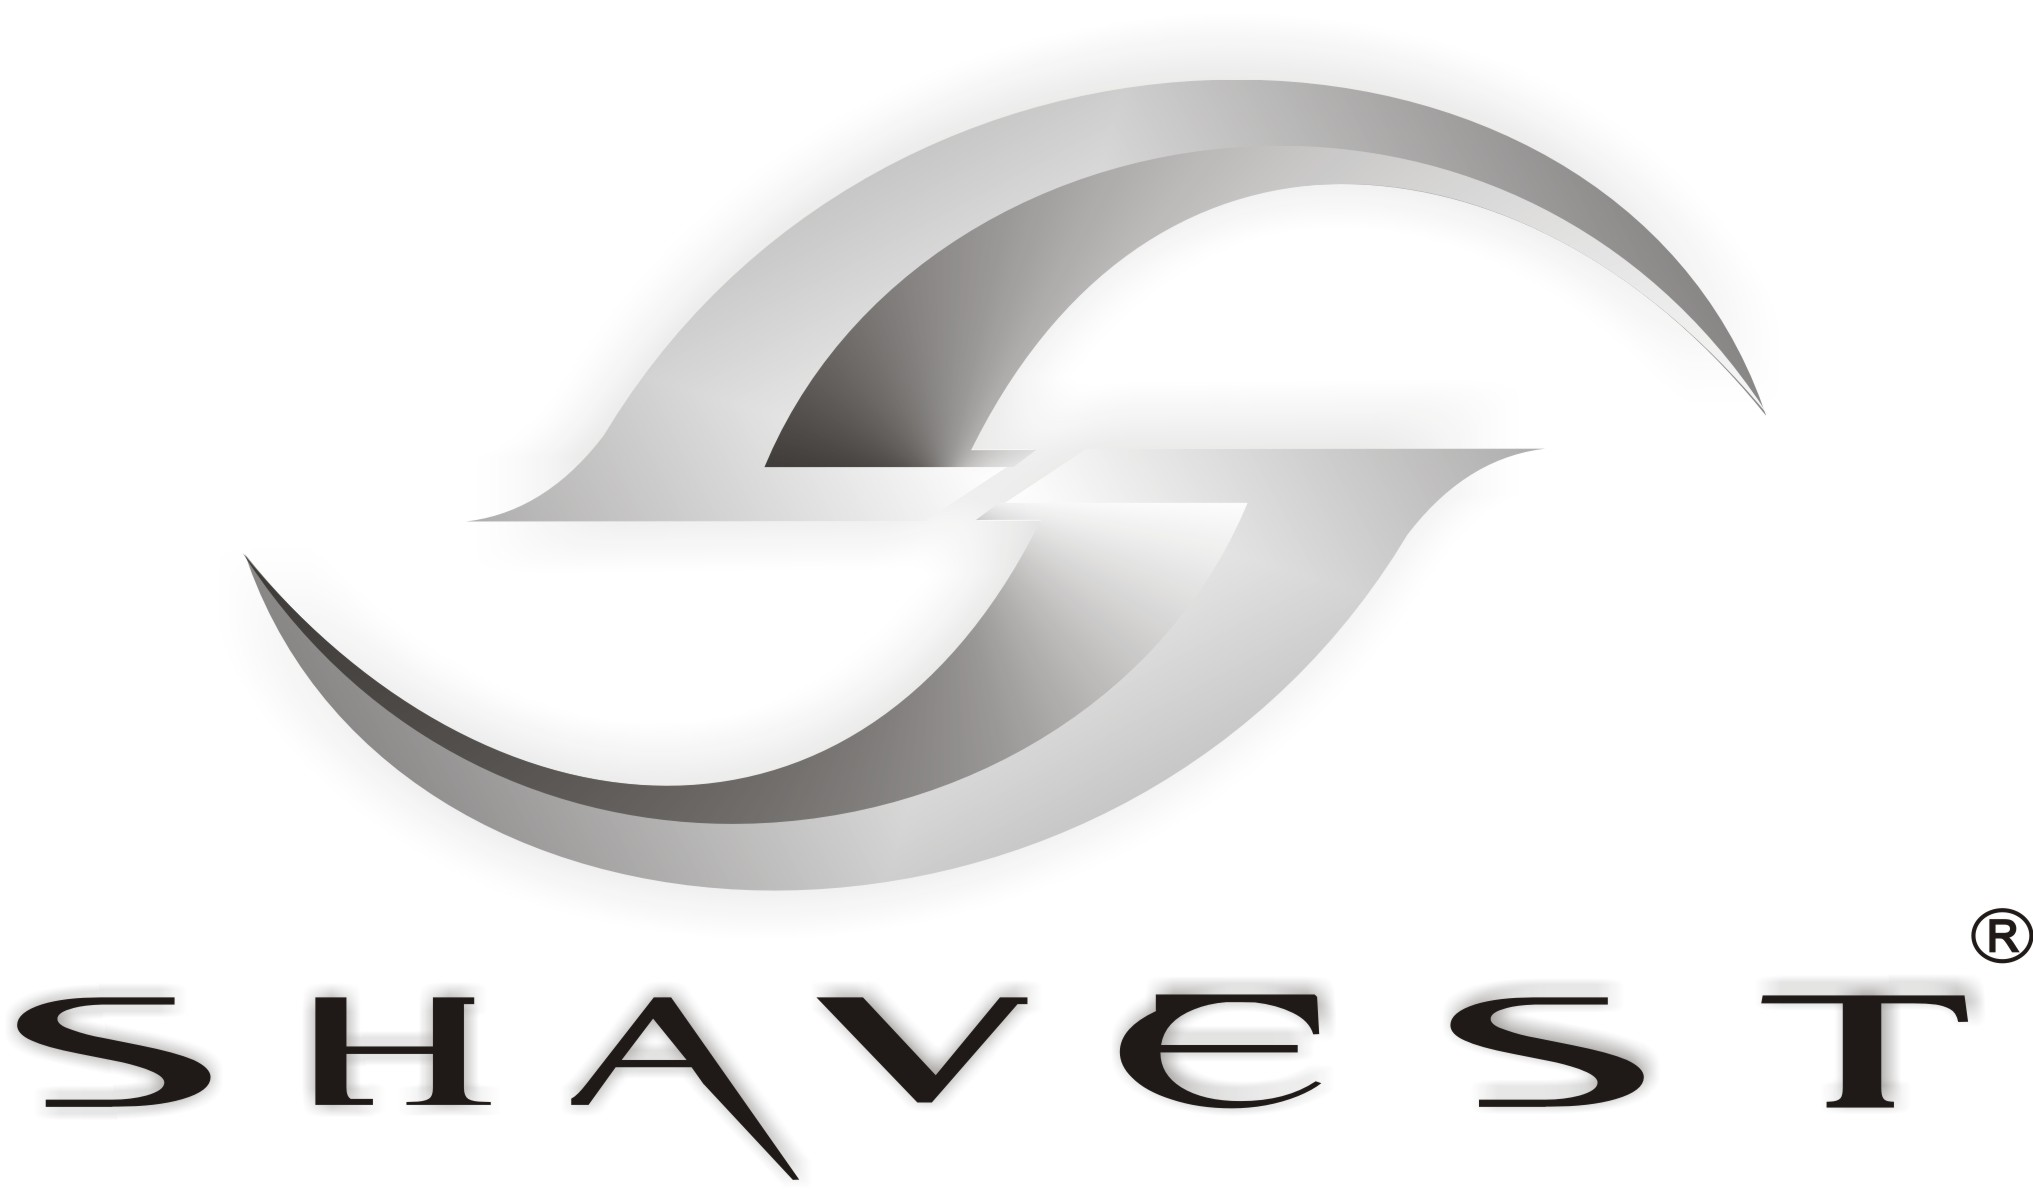 Logo shavest